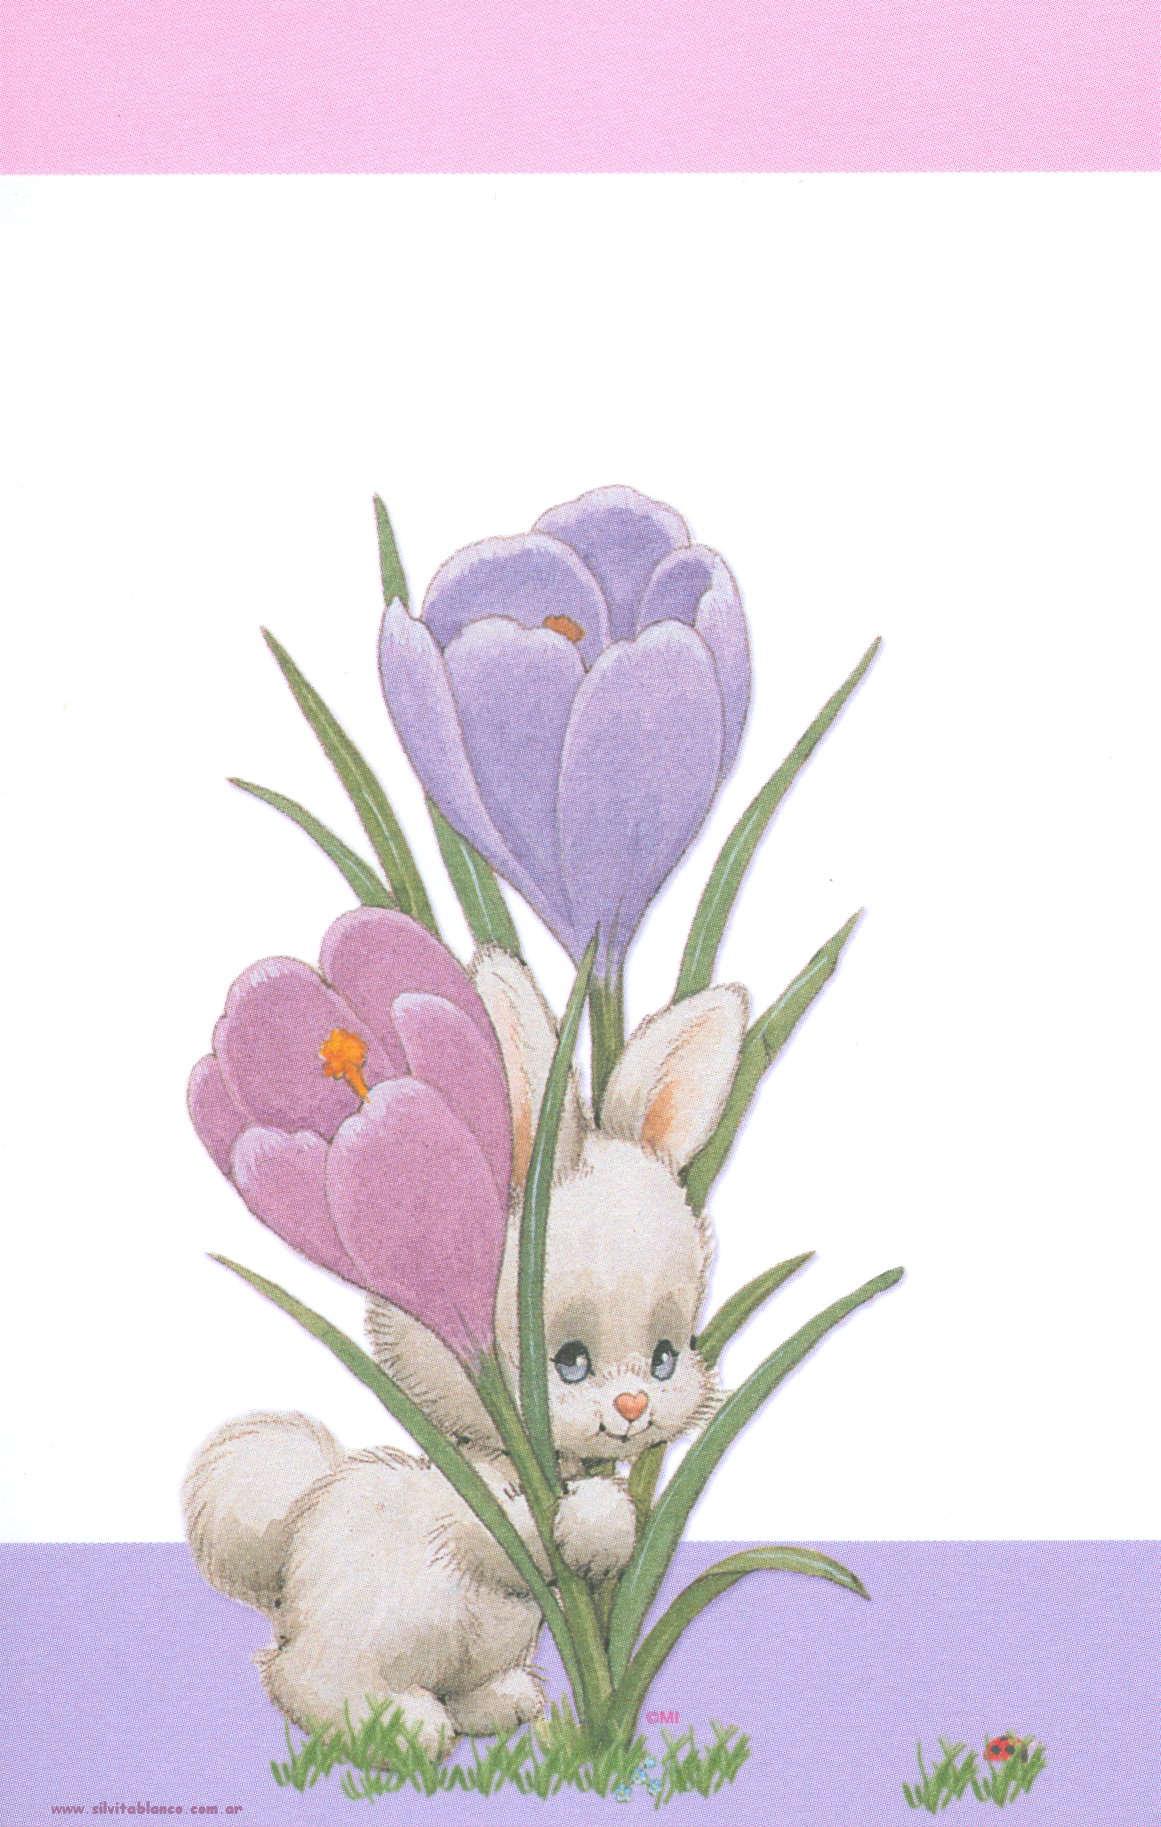 Conejos-wallpaper-wp5205361